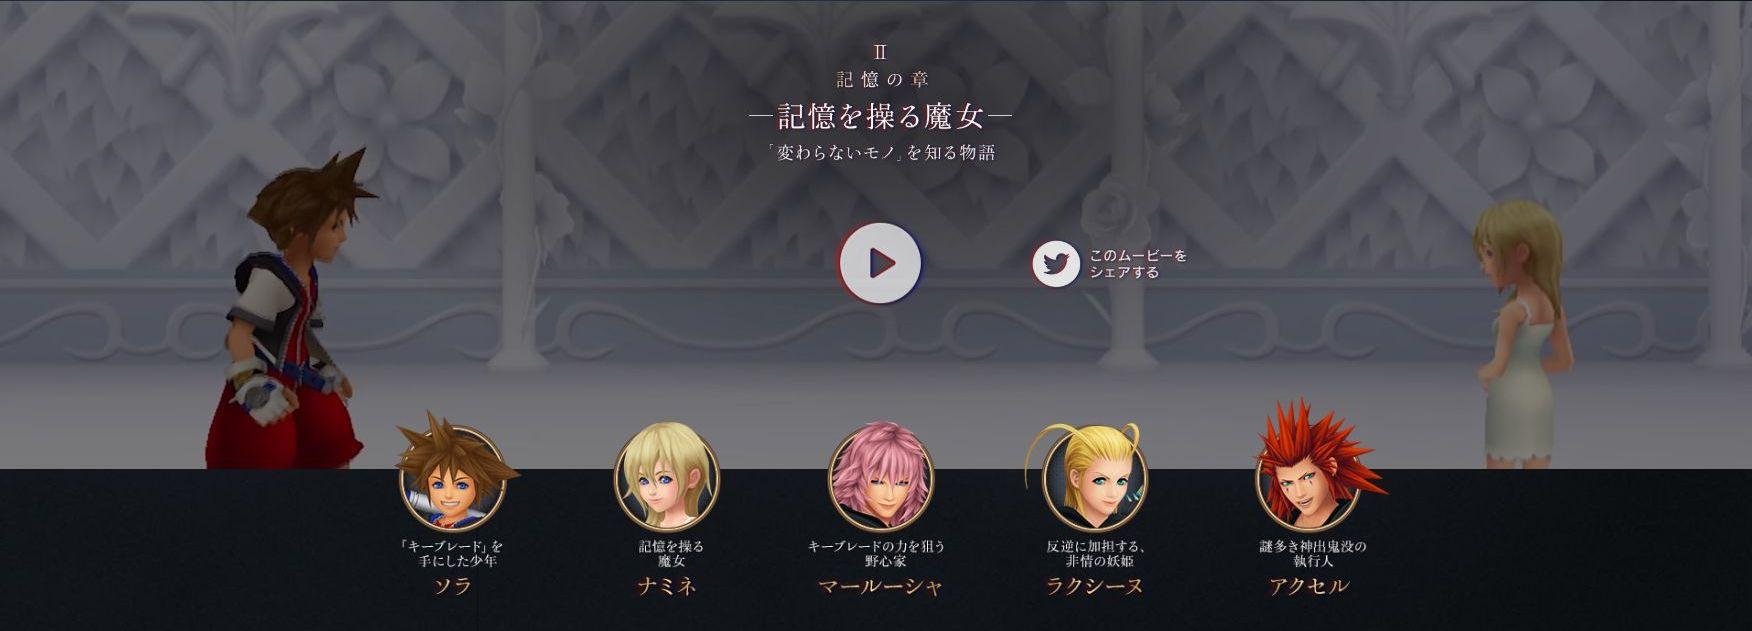 kingdom hearts episodes 3